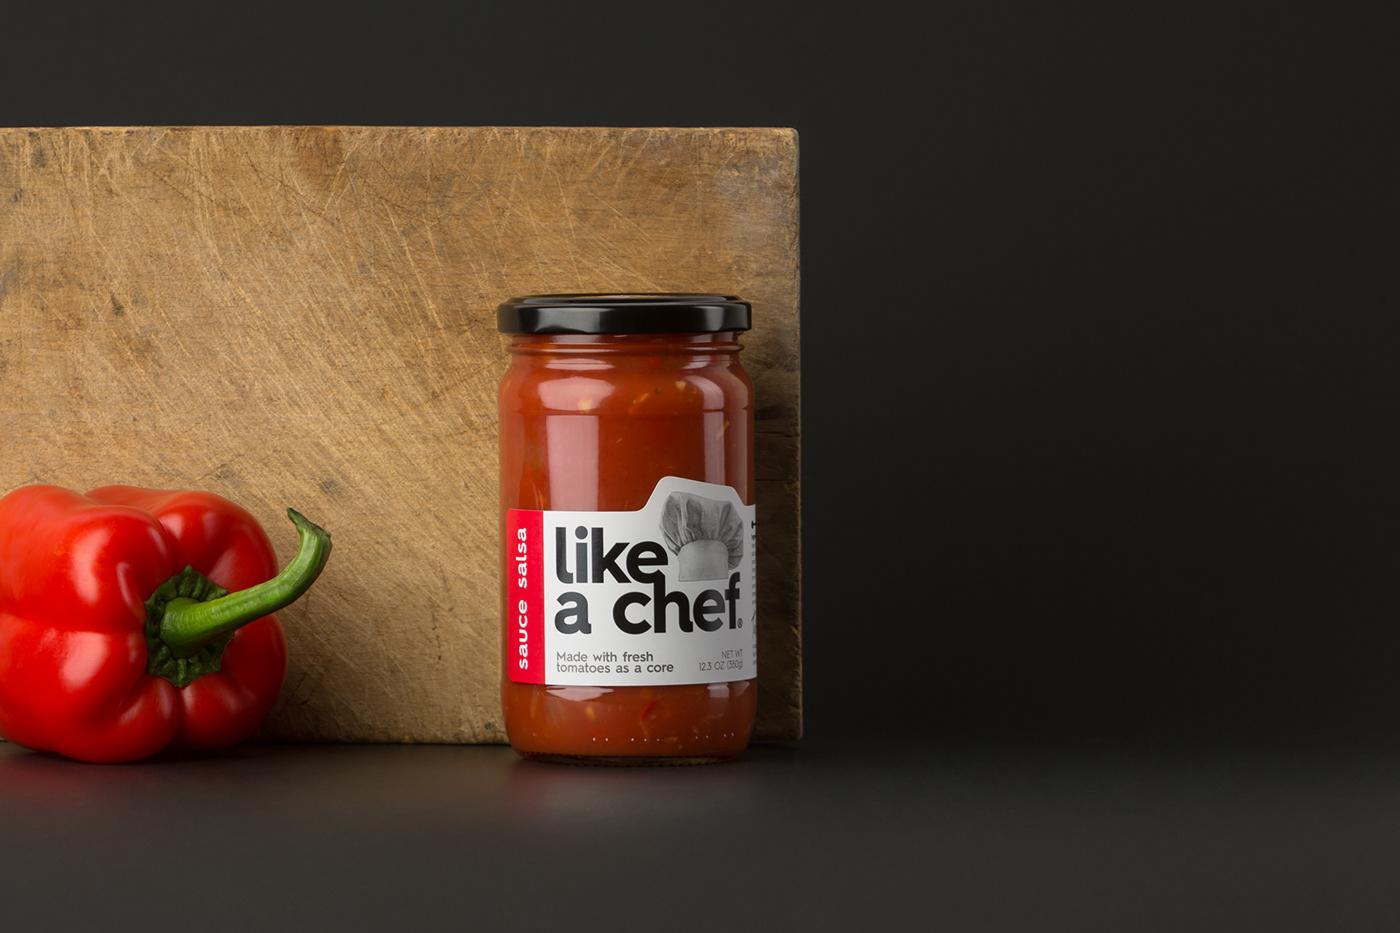 oregano Tomato cusine blak glass arrabbiata premium Photography  Basil Thyme